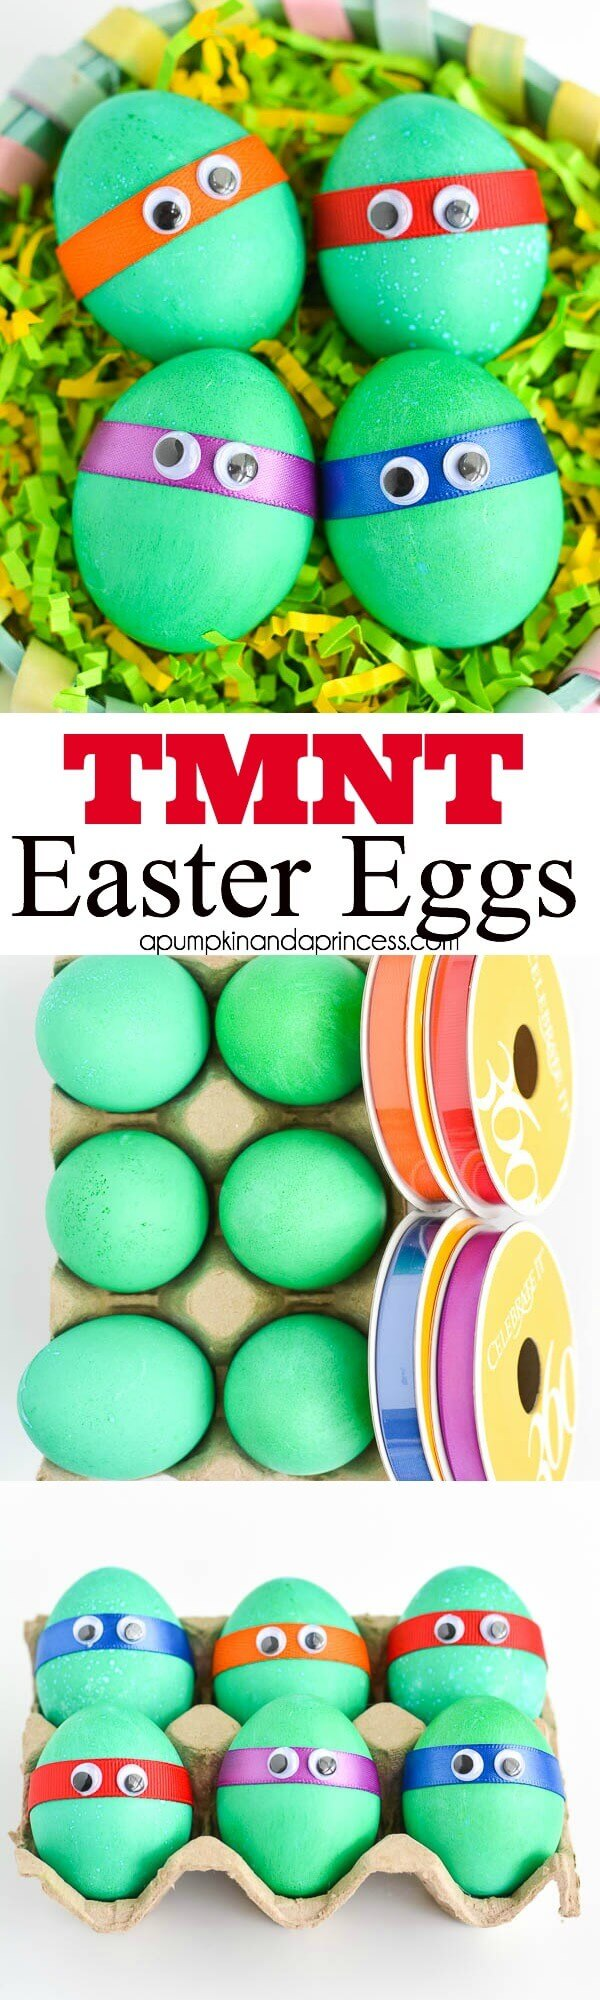 Teenage Mutant Ninja Turtle-themed Easter eggs are easy and fun